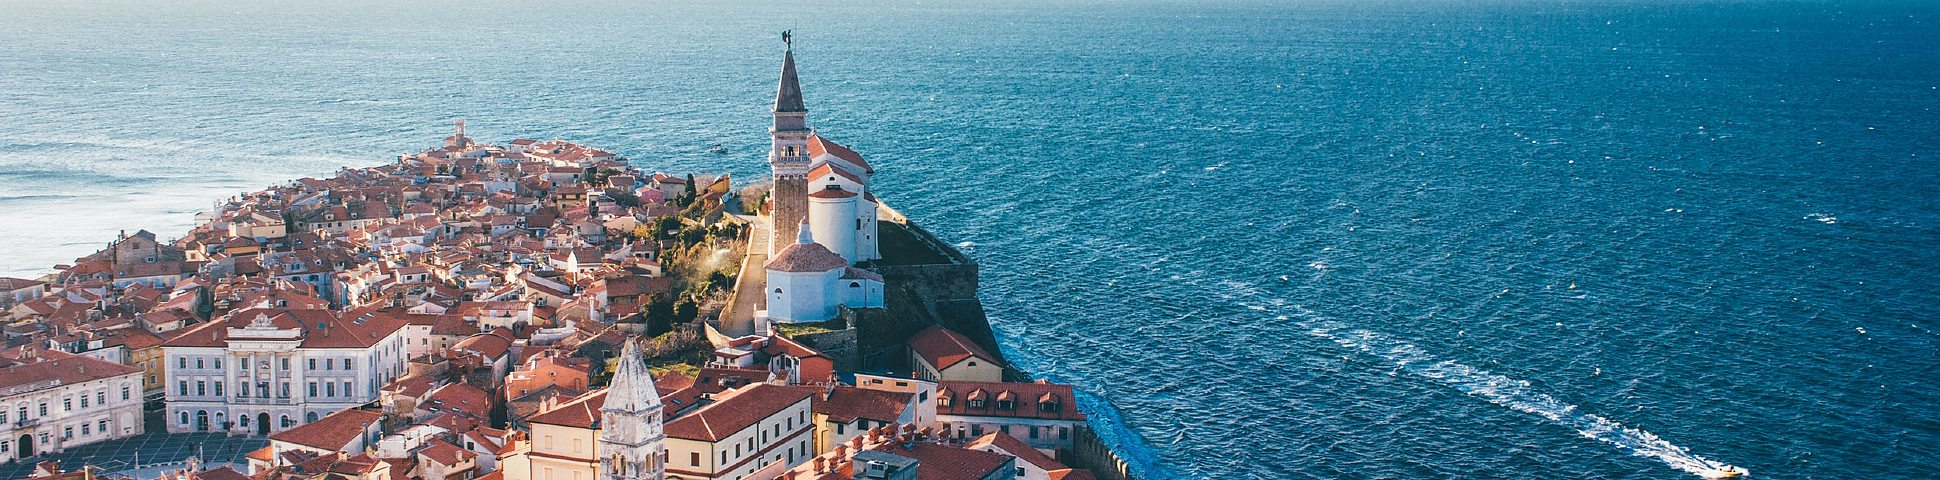 Adriatic Sea in Slovenia